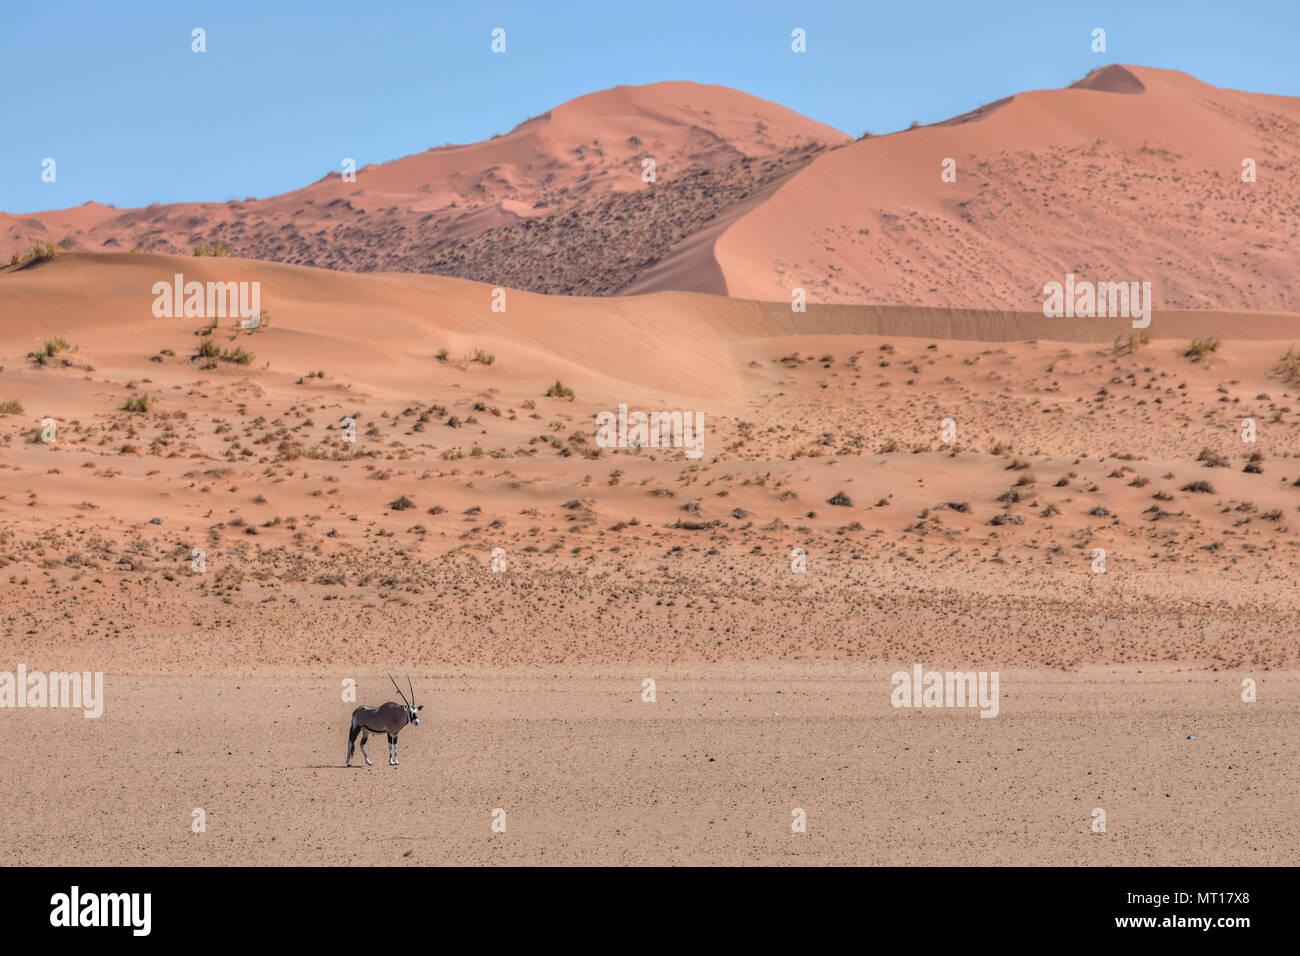 Gemsbok, Sossusvlei, désert du Namib, Namibie, Afrique Photo Stock